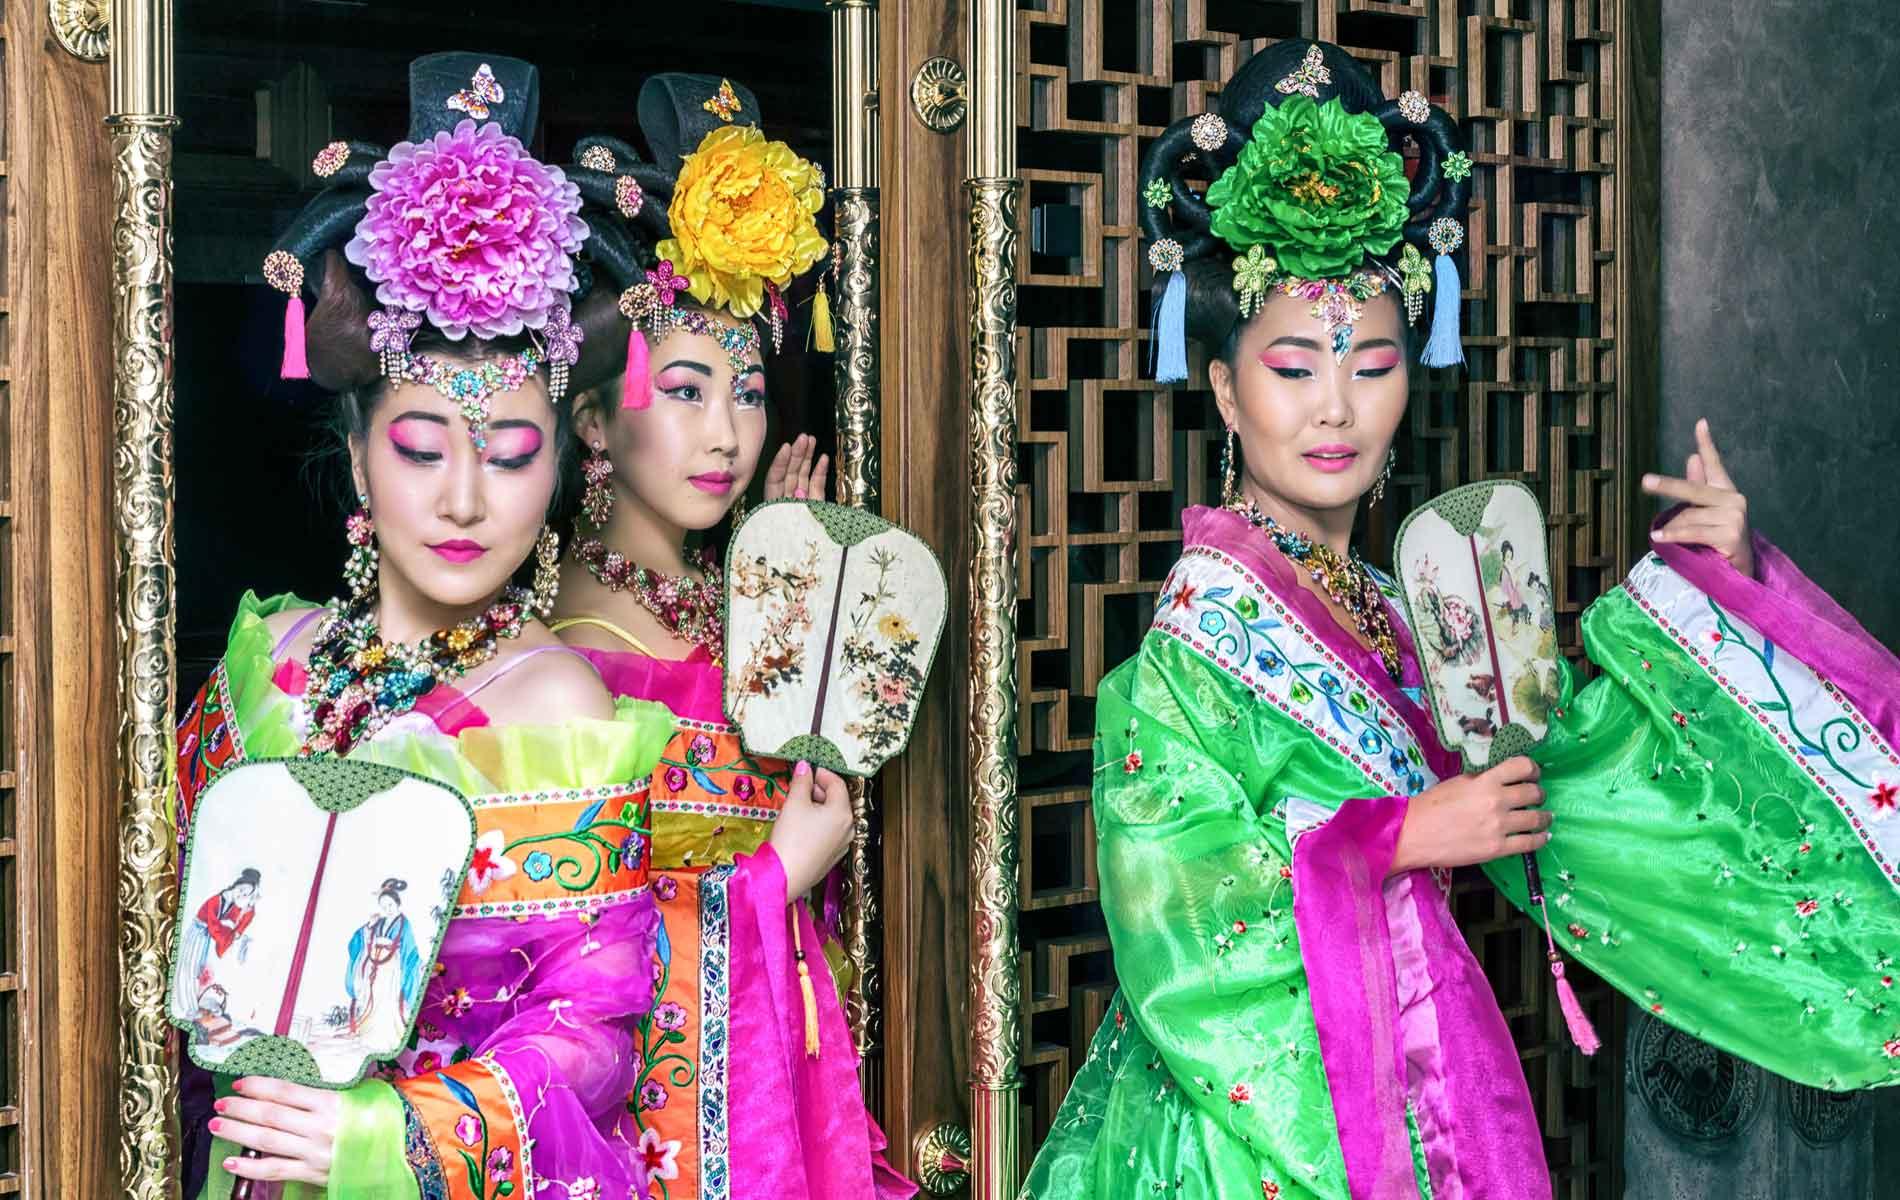 Three Japanese Geishas